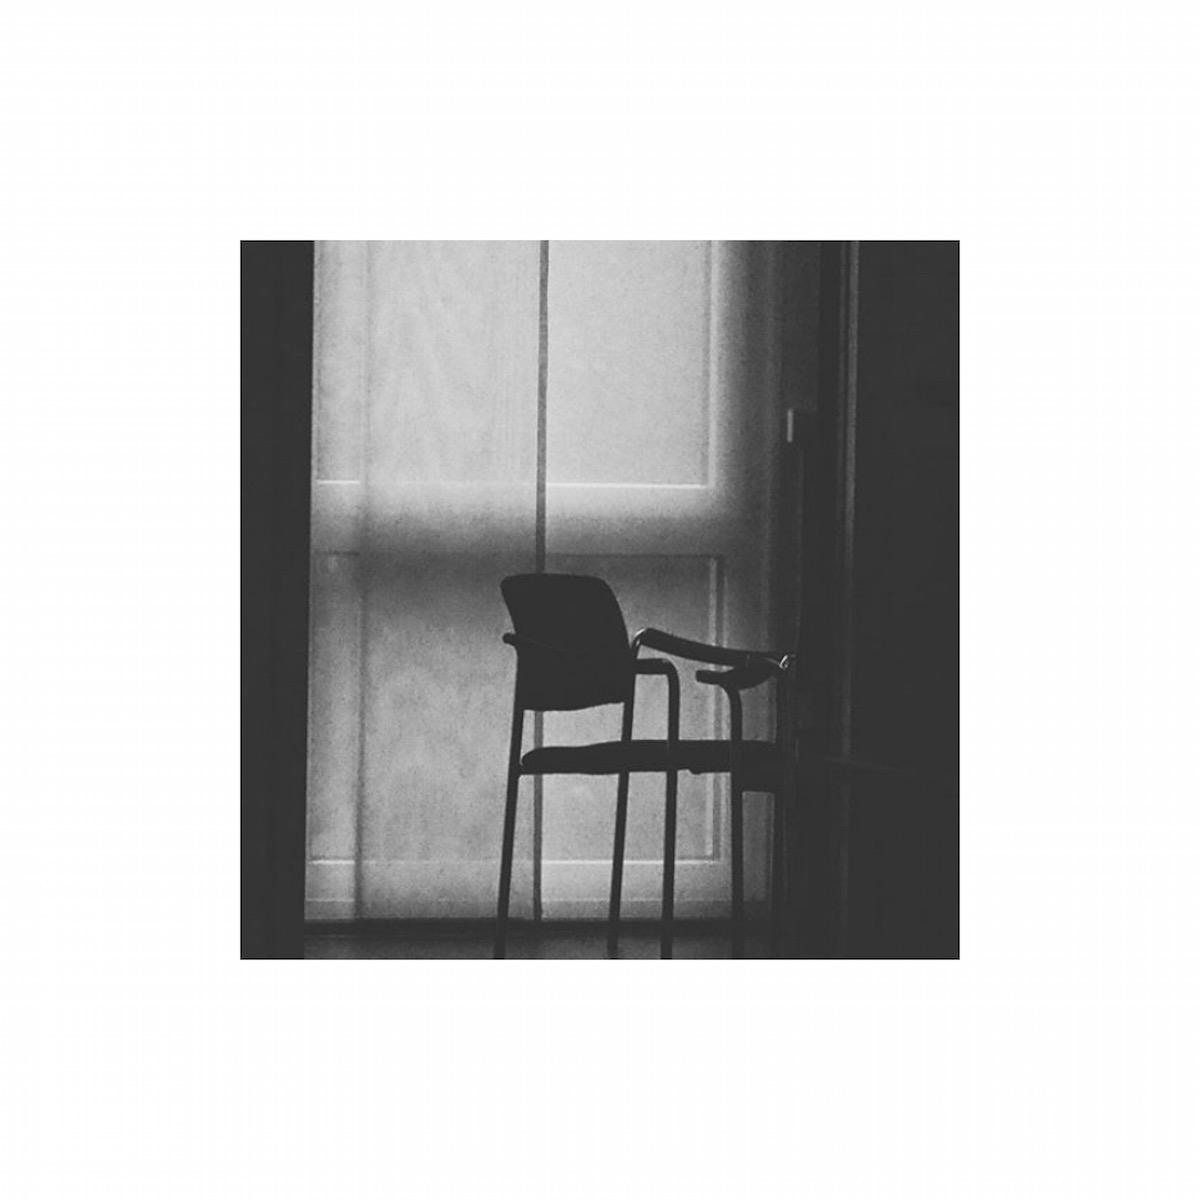 @grrrrek, Breathe, photography (2020)